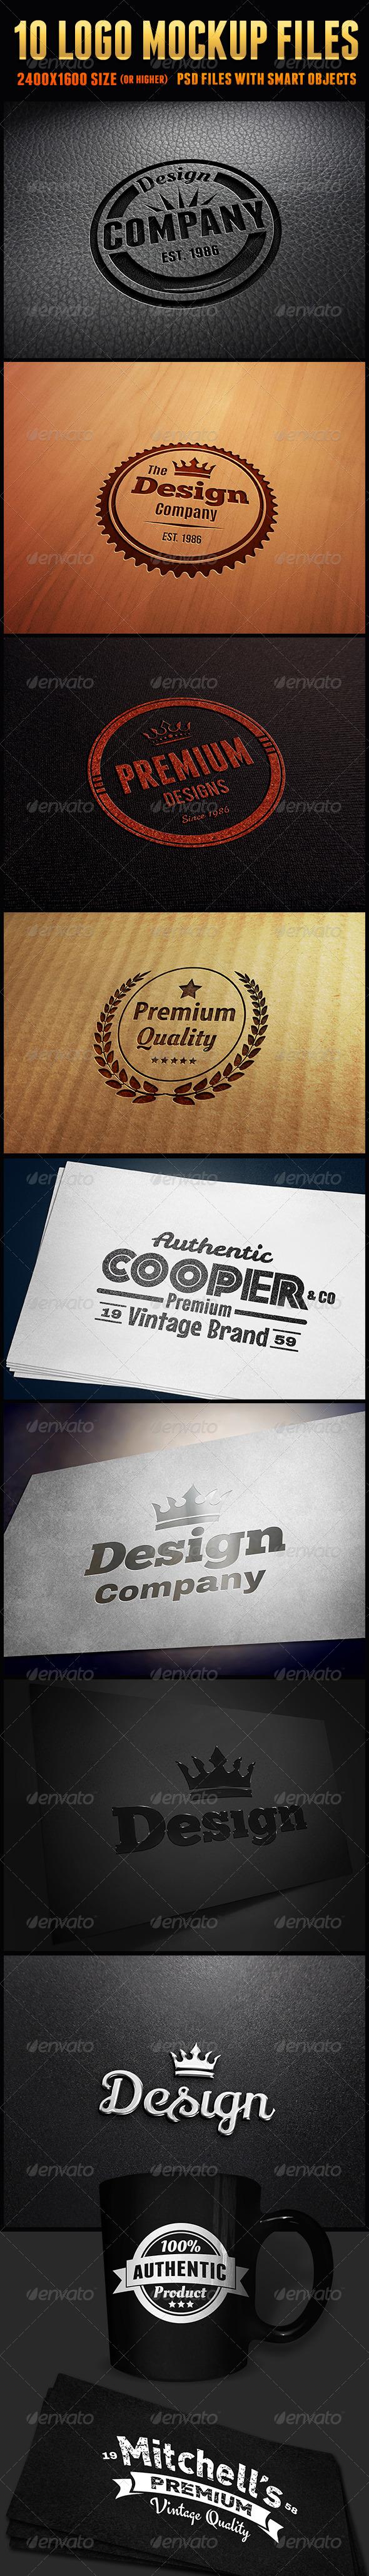 GraphicRiver 10 Logo Mockup Files 5995409